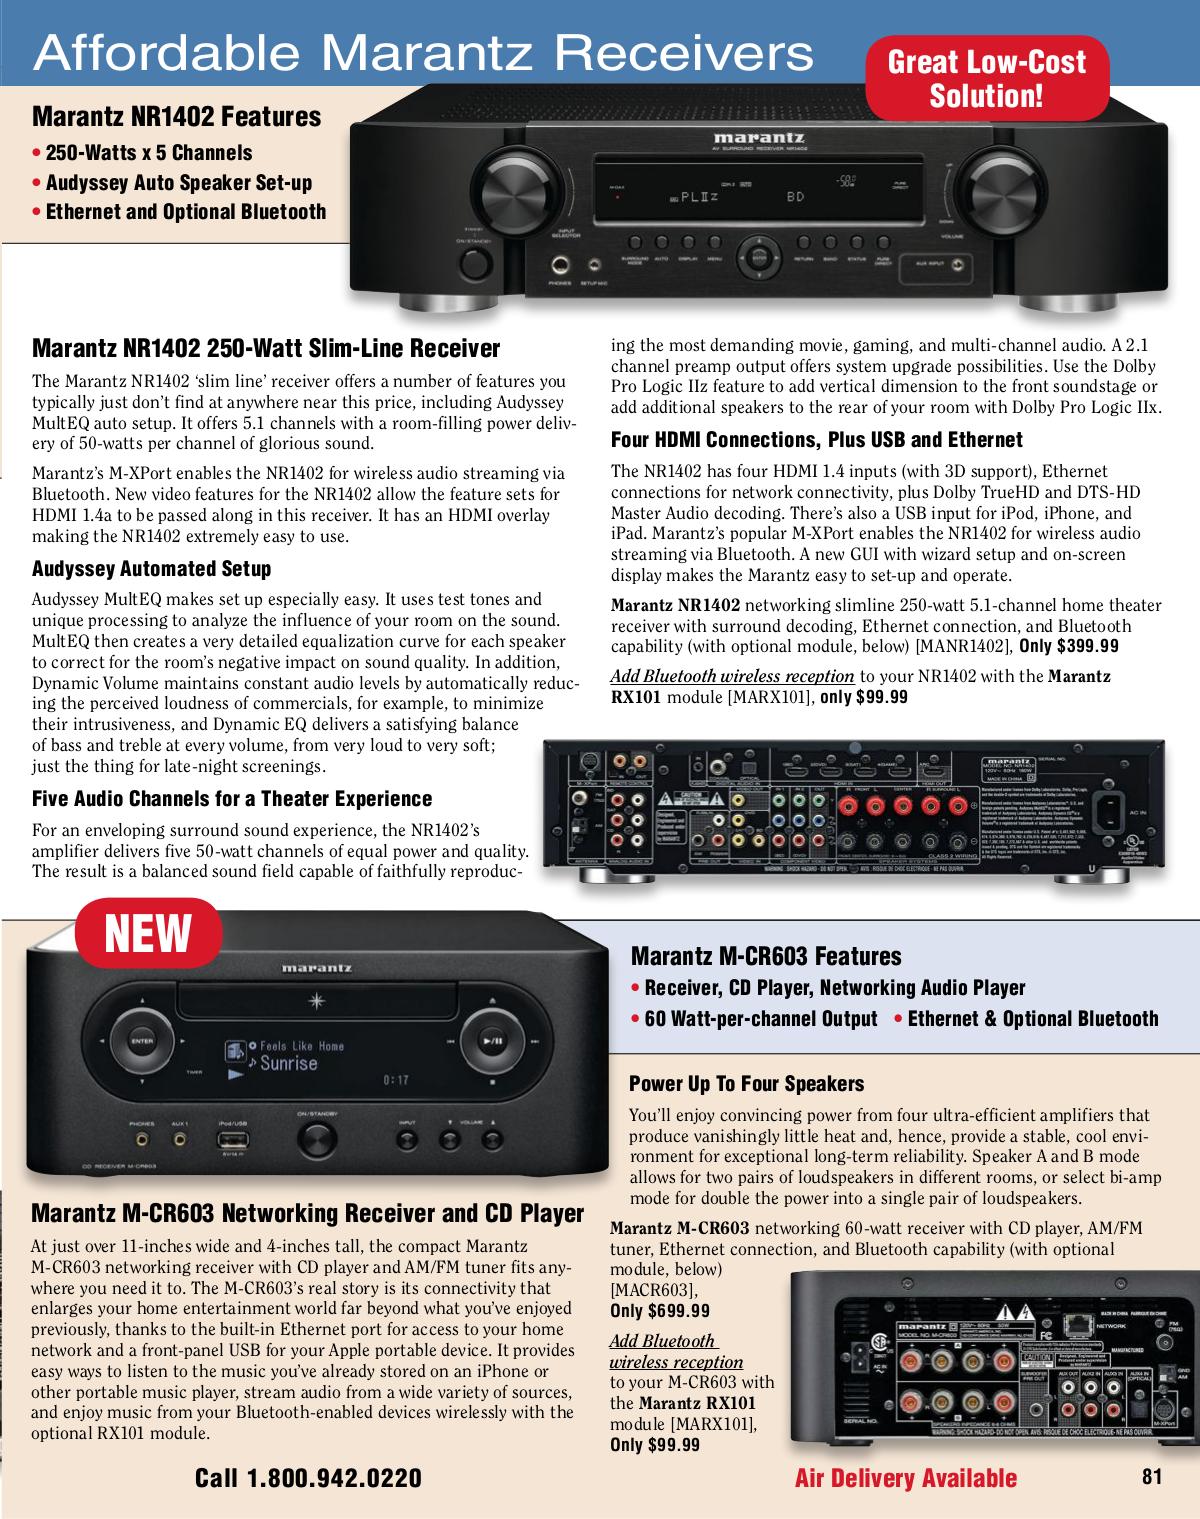 download free pdf for marantz nr1402 receiver manual rh umlib com Marantz NR1402 Review Marantz NR1402 AV Receiver Review